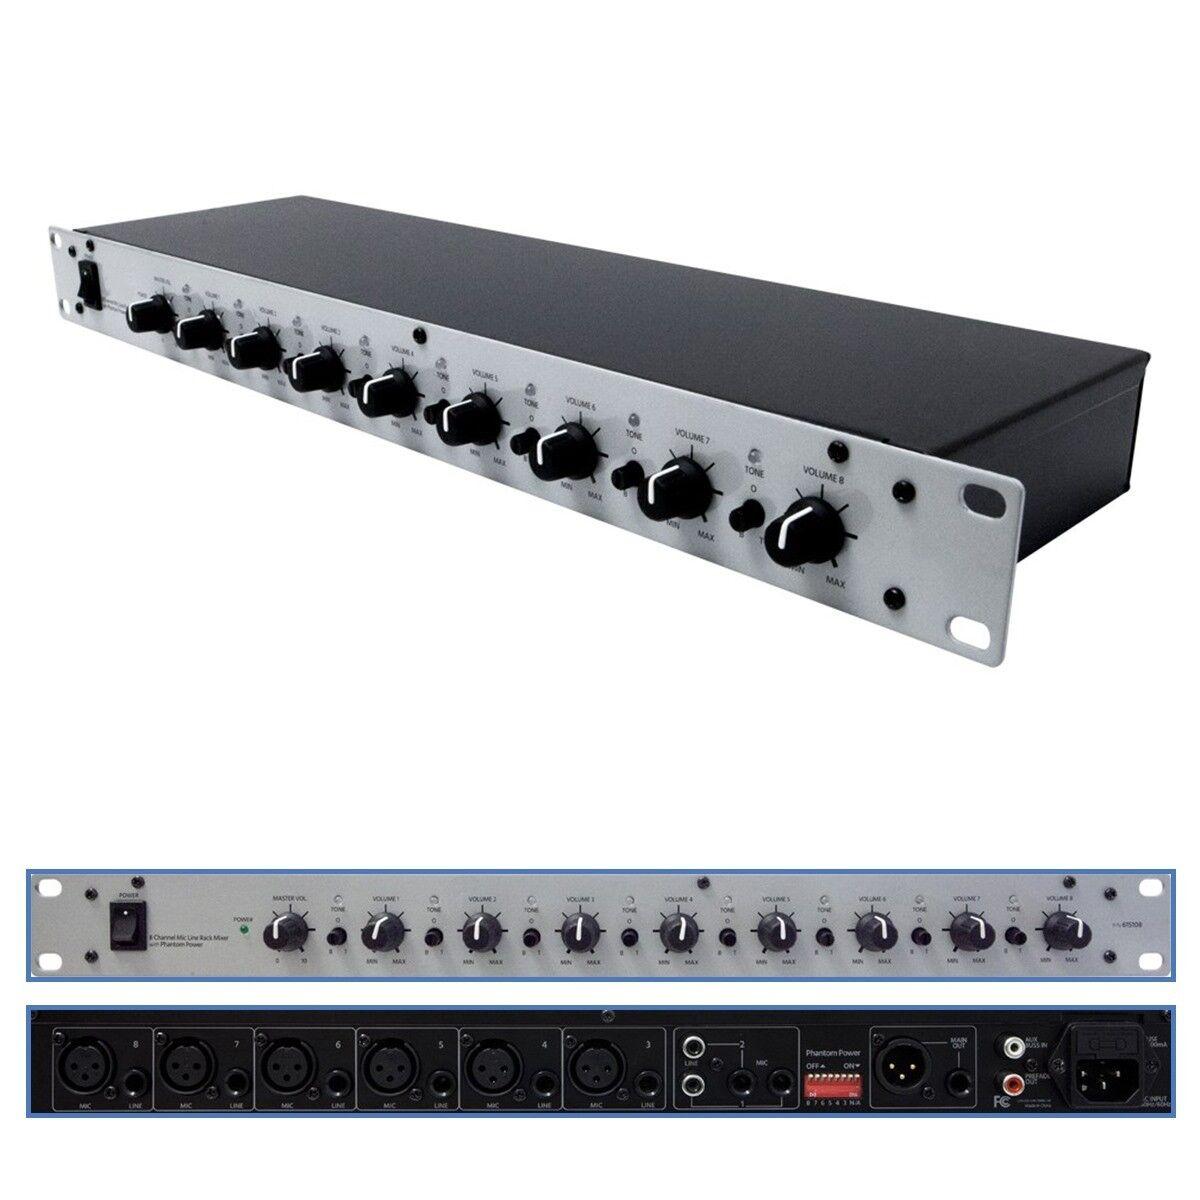 8 channel microphone line mixer xlr 1 4 trs rca 48v phantom power rack mount 1u ebay. Black Bedroom Furniture Sets. Home Design Ideas